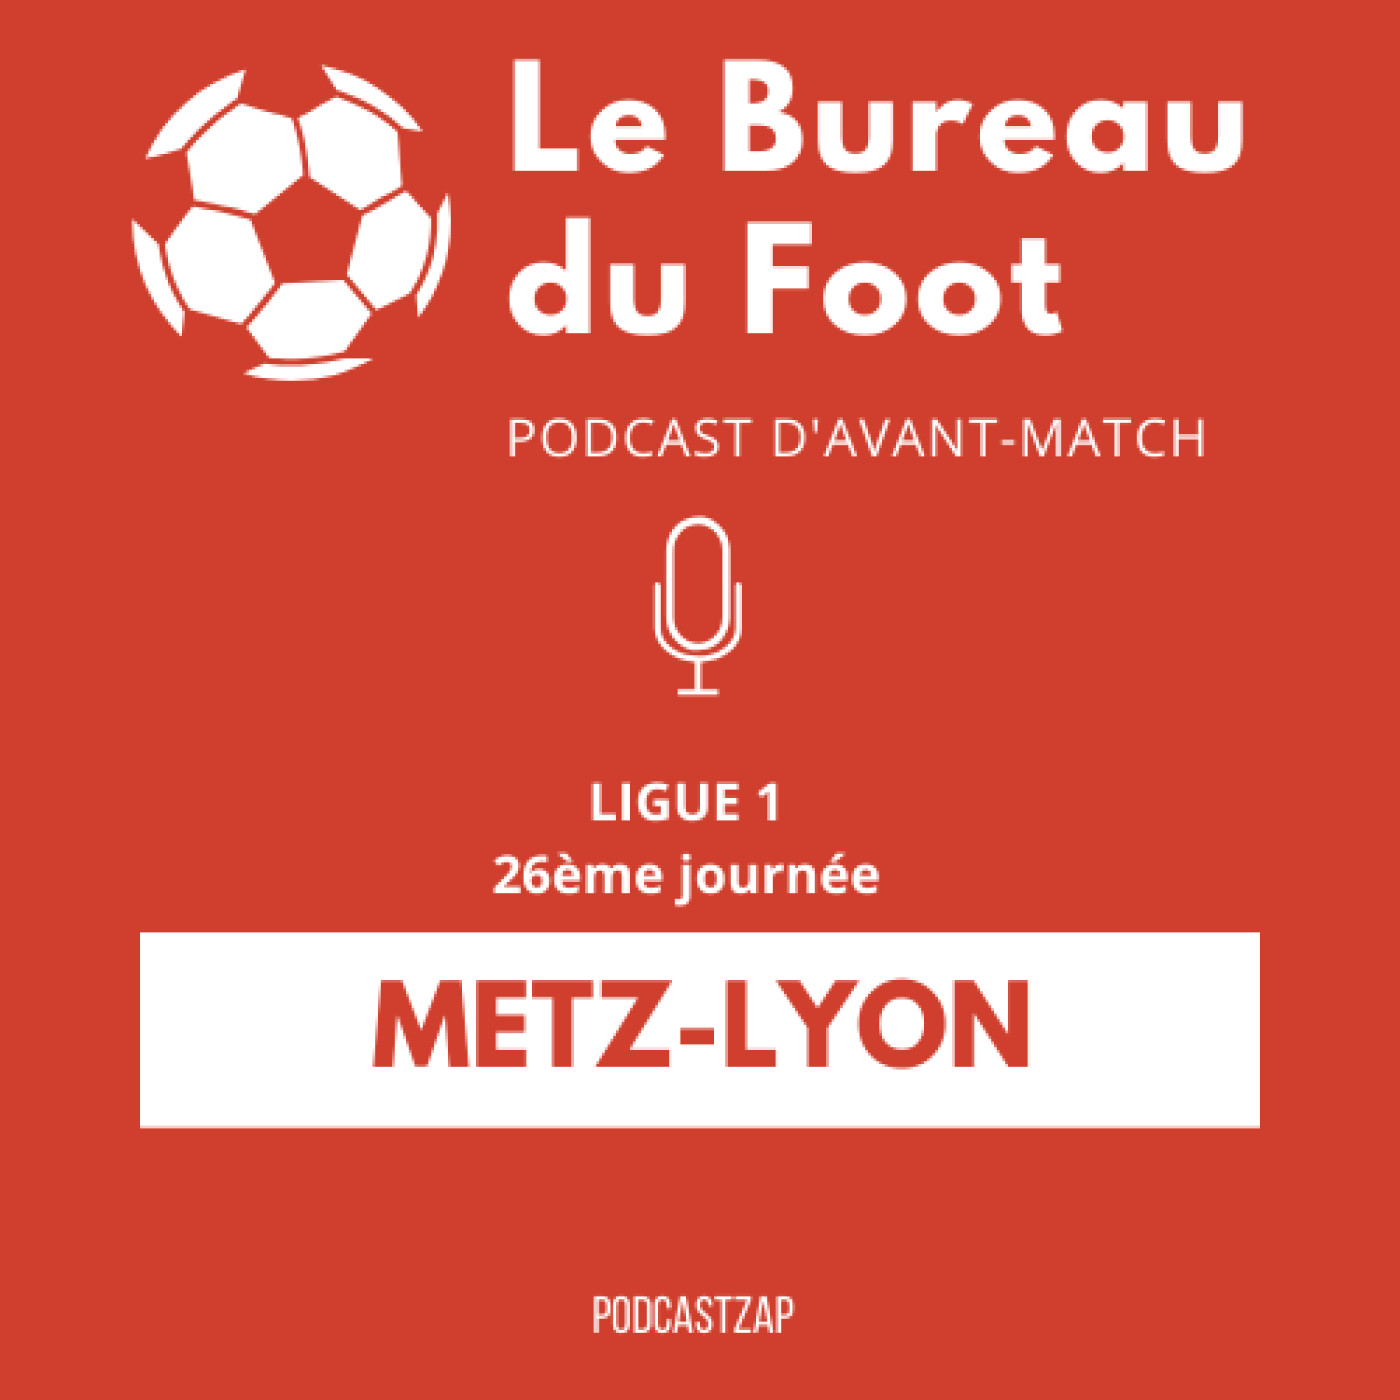 S1E07 - Ligue 1 - Journée 26 - Metz - Lyon